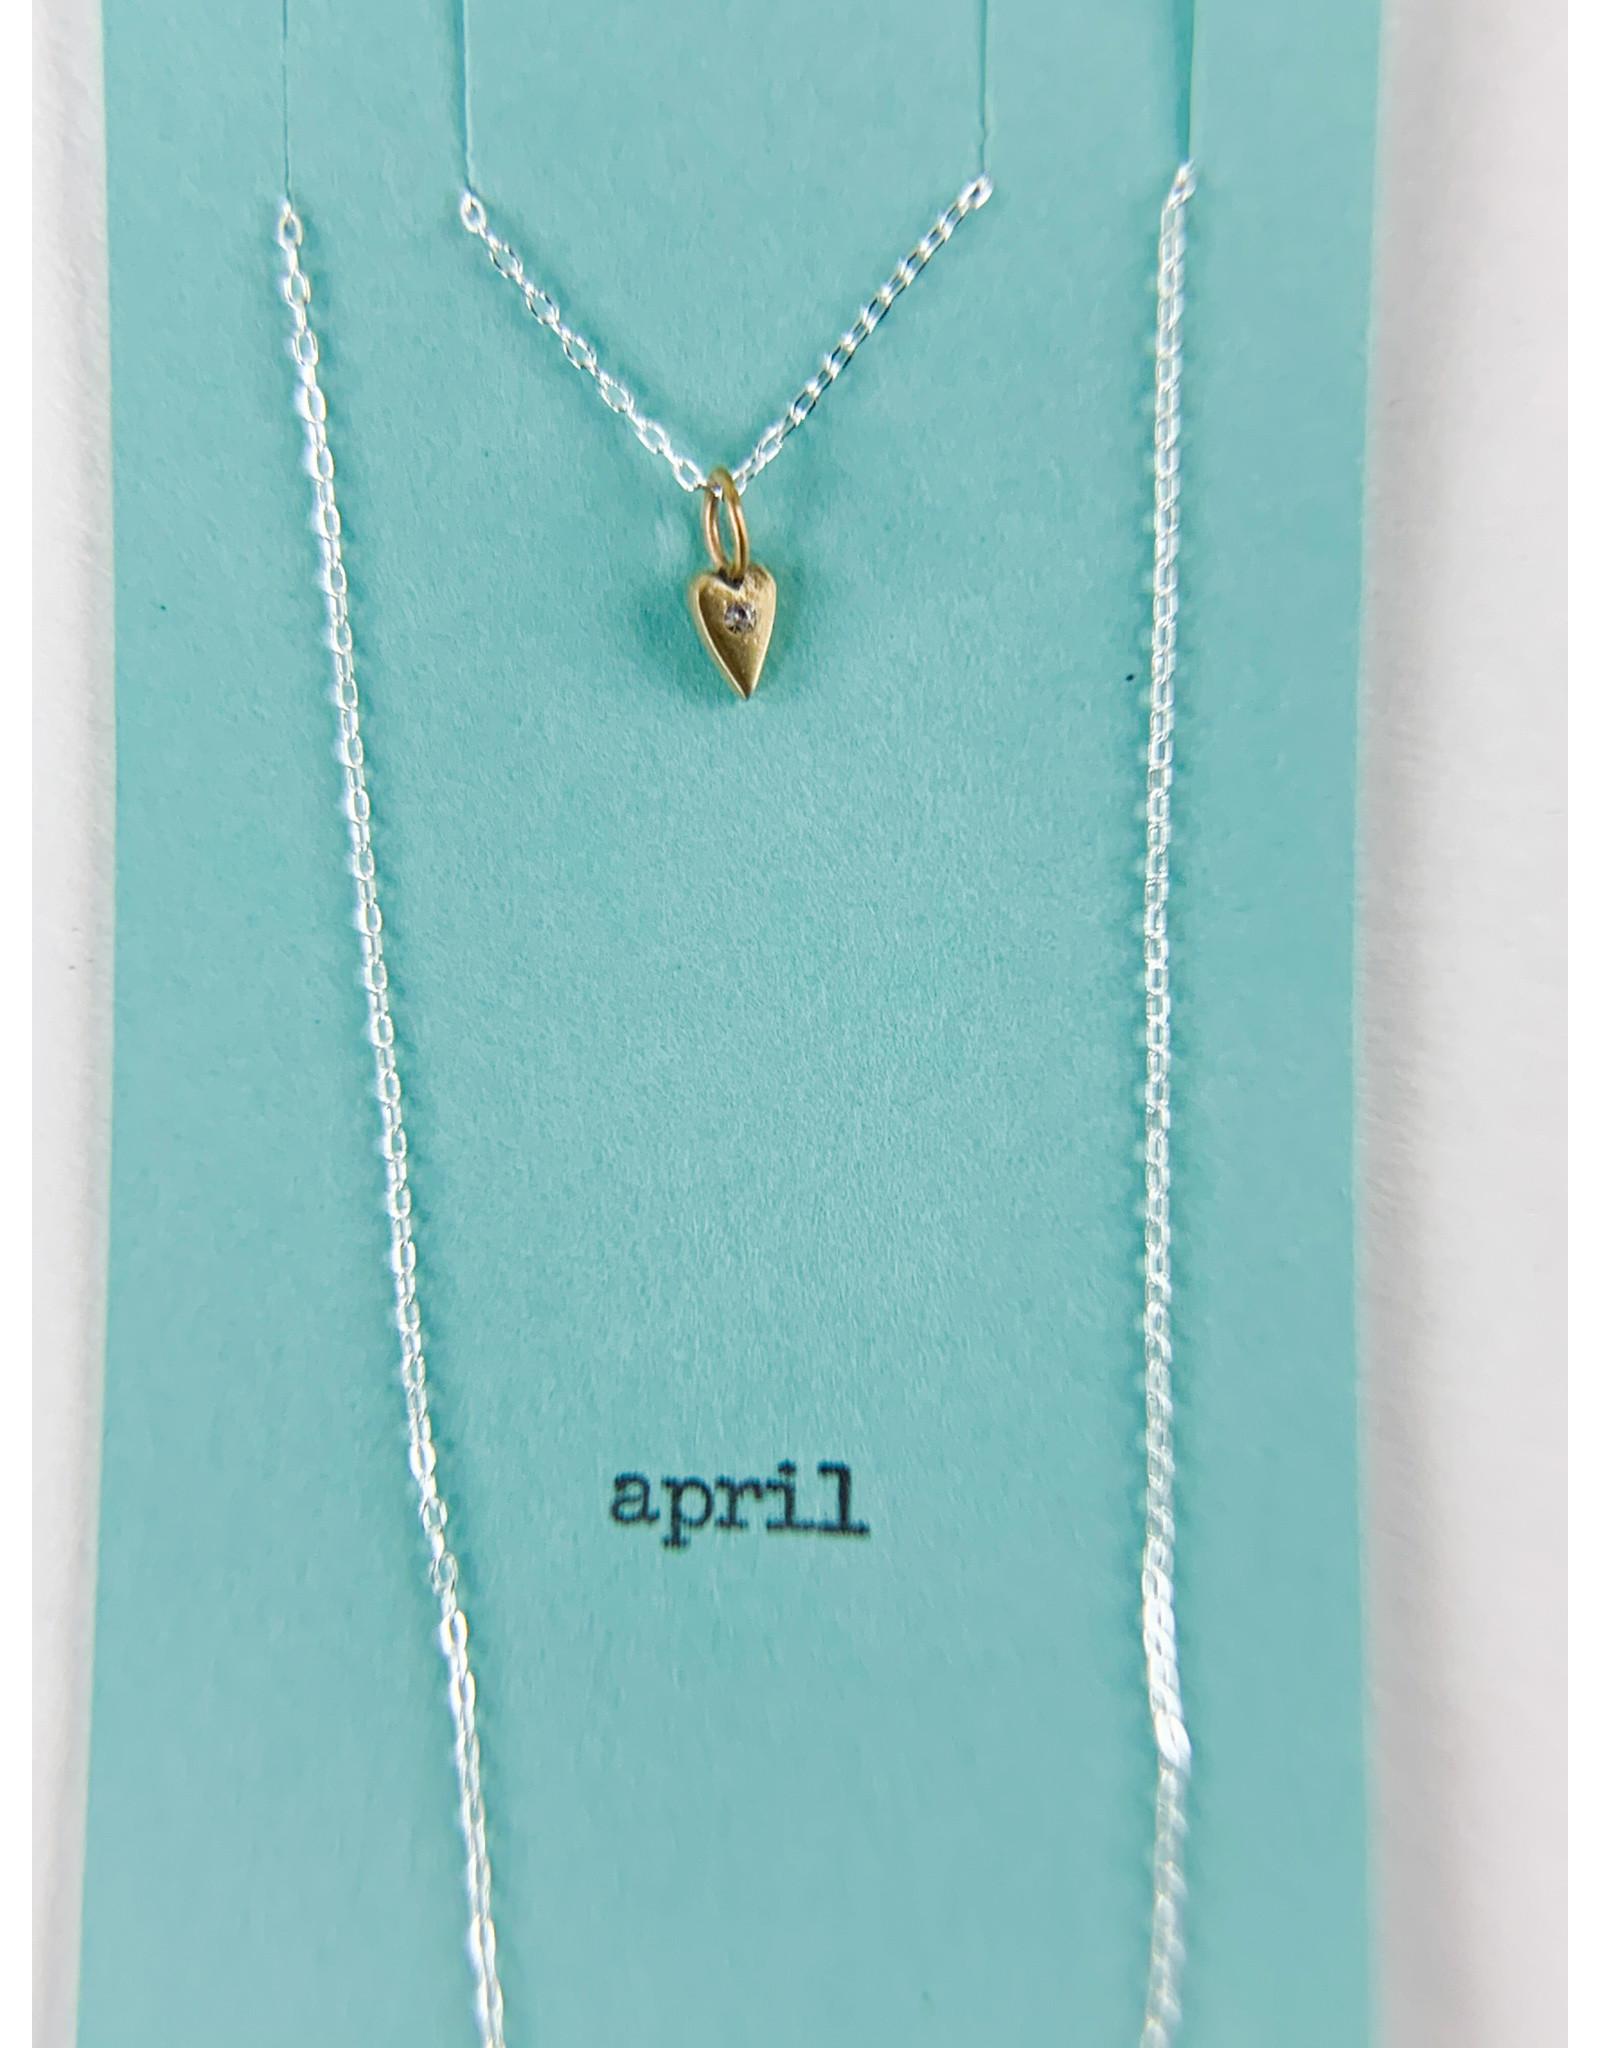 penny larsen April Necklace/Diamond